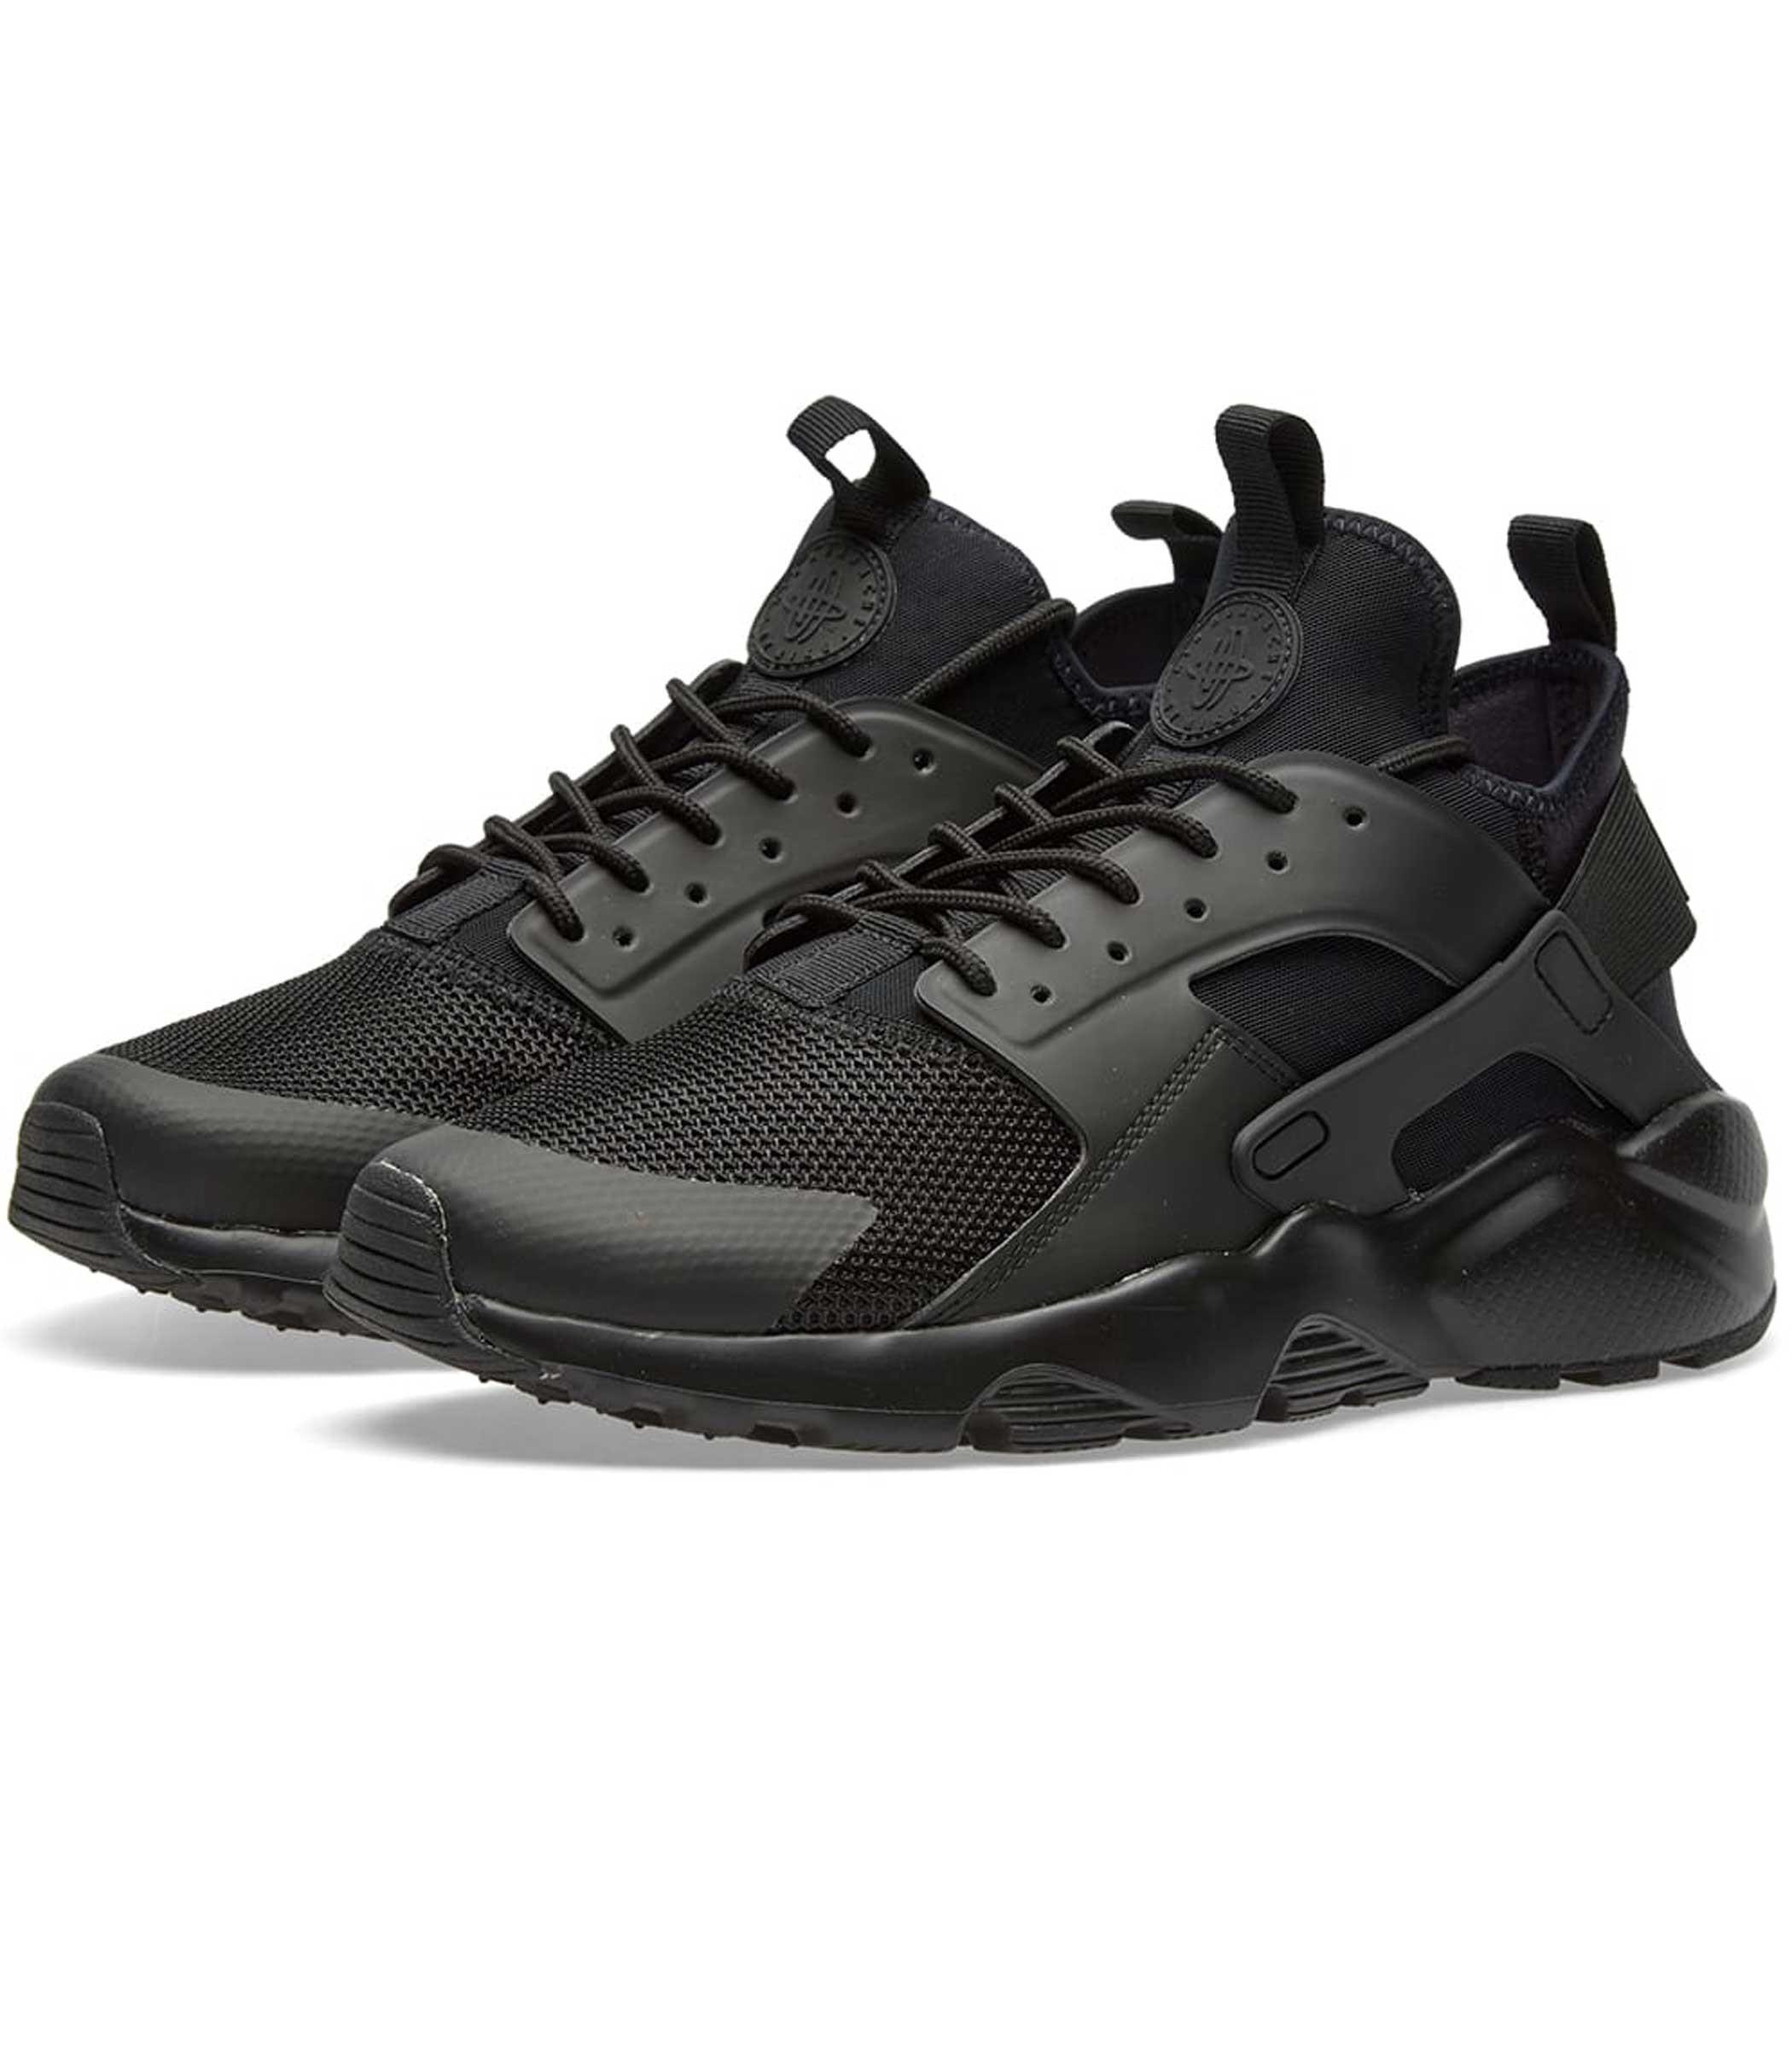 Scarpe Nike Air Huarache Run Ultra 847569-004 www.montorostore.it f87f6590442